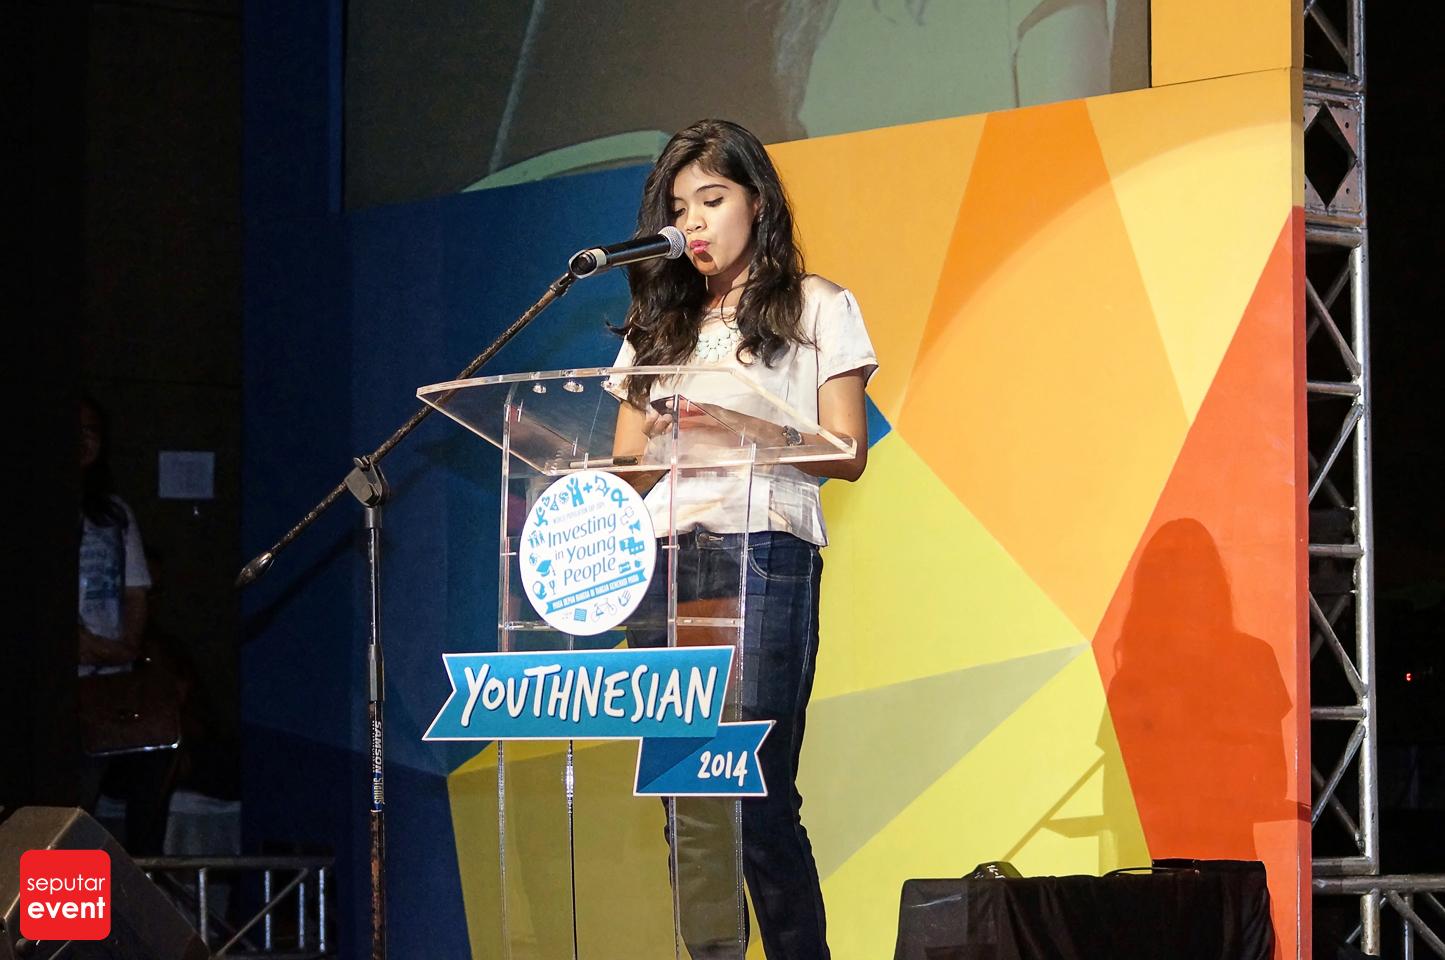 youthnesian-2014 (46).JPG